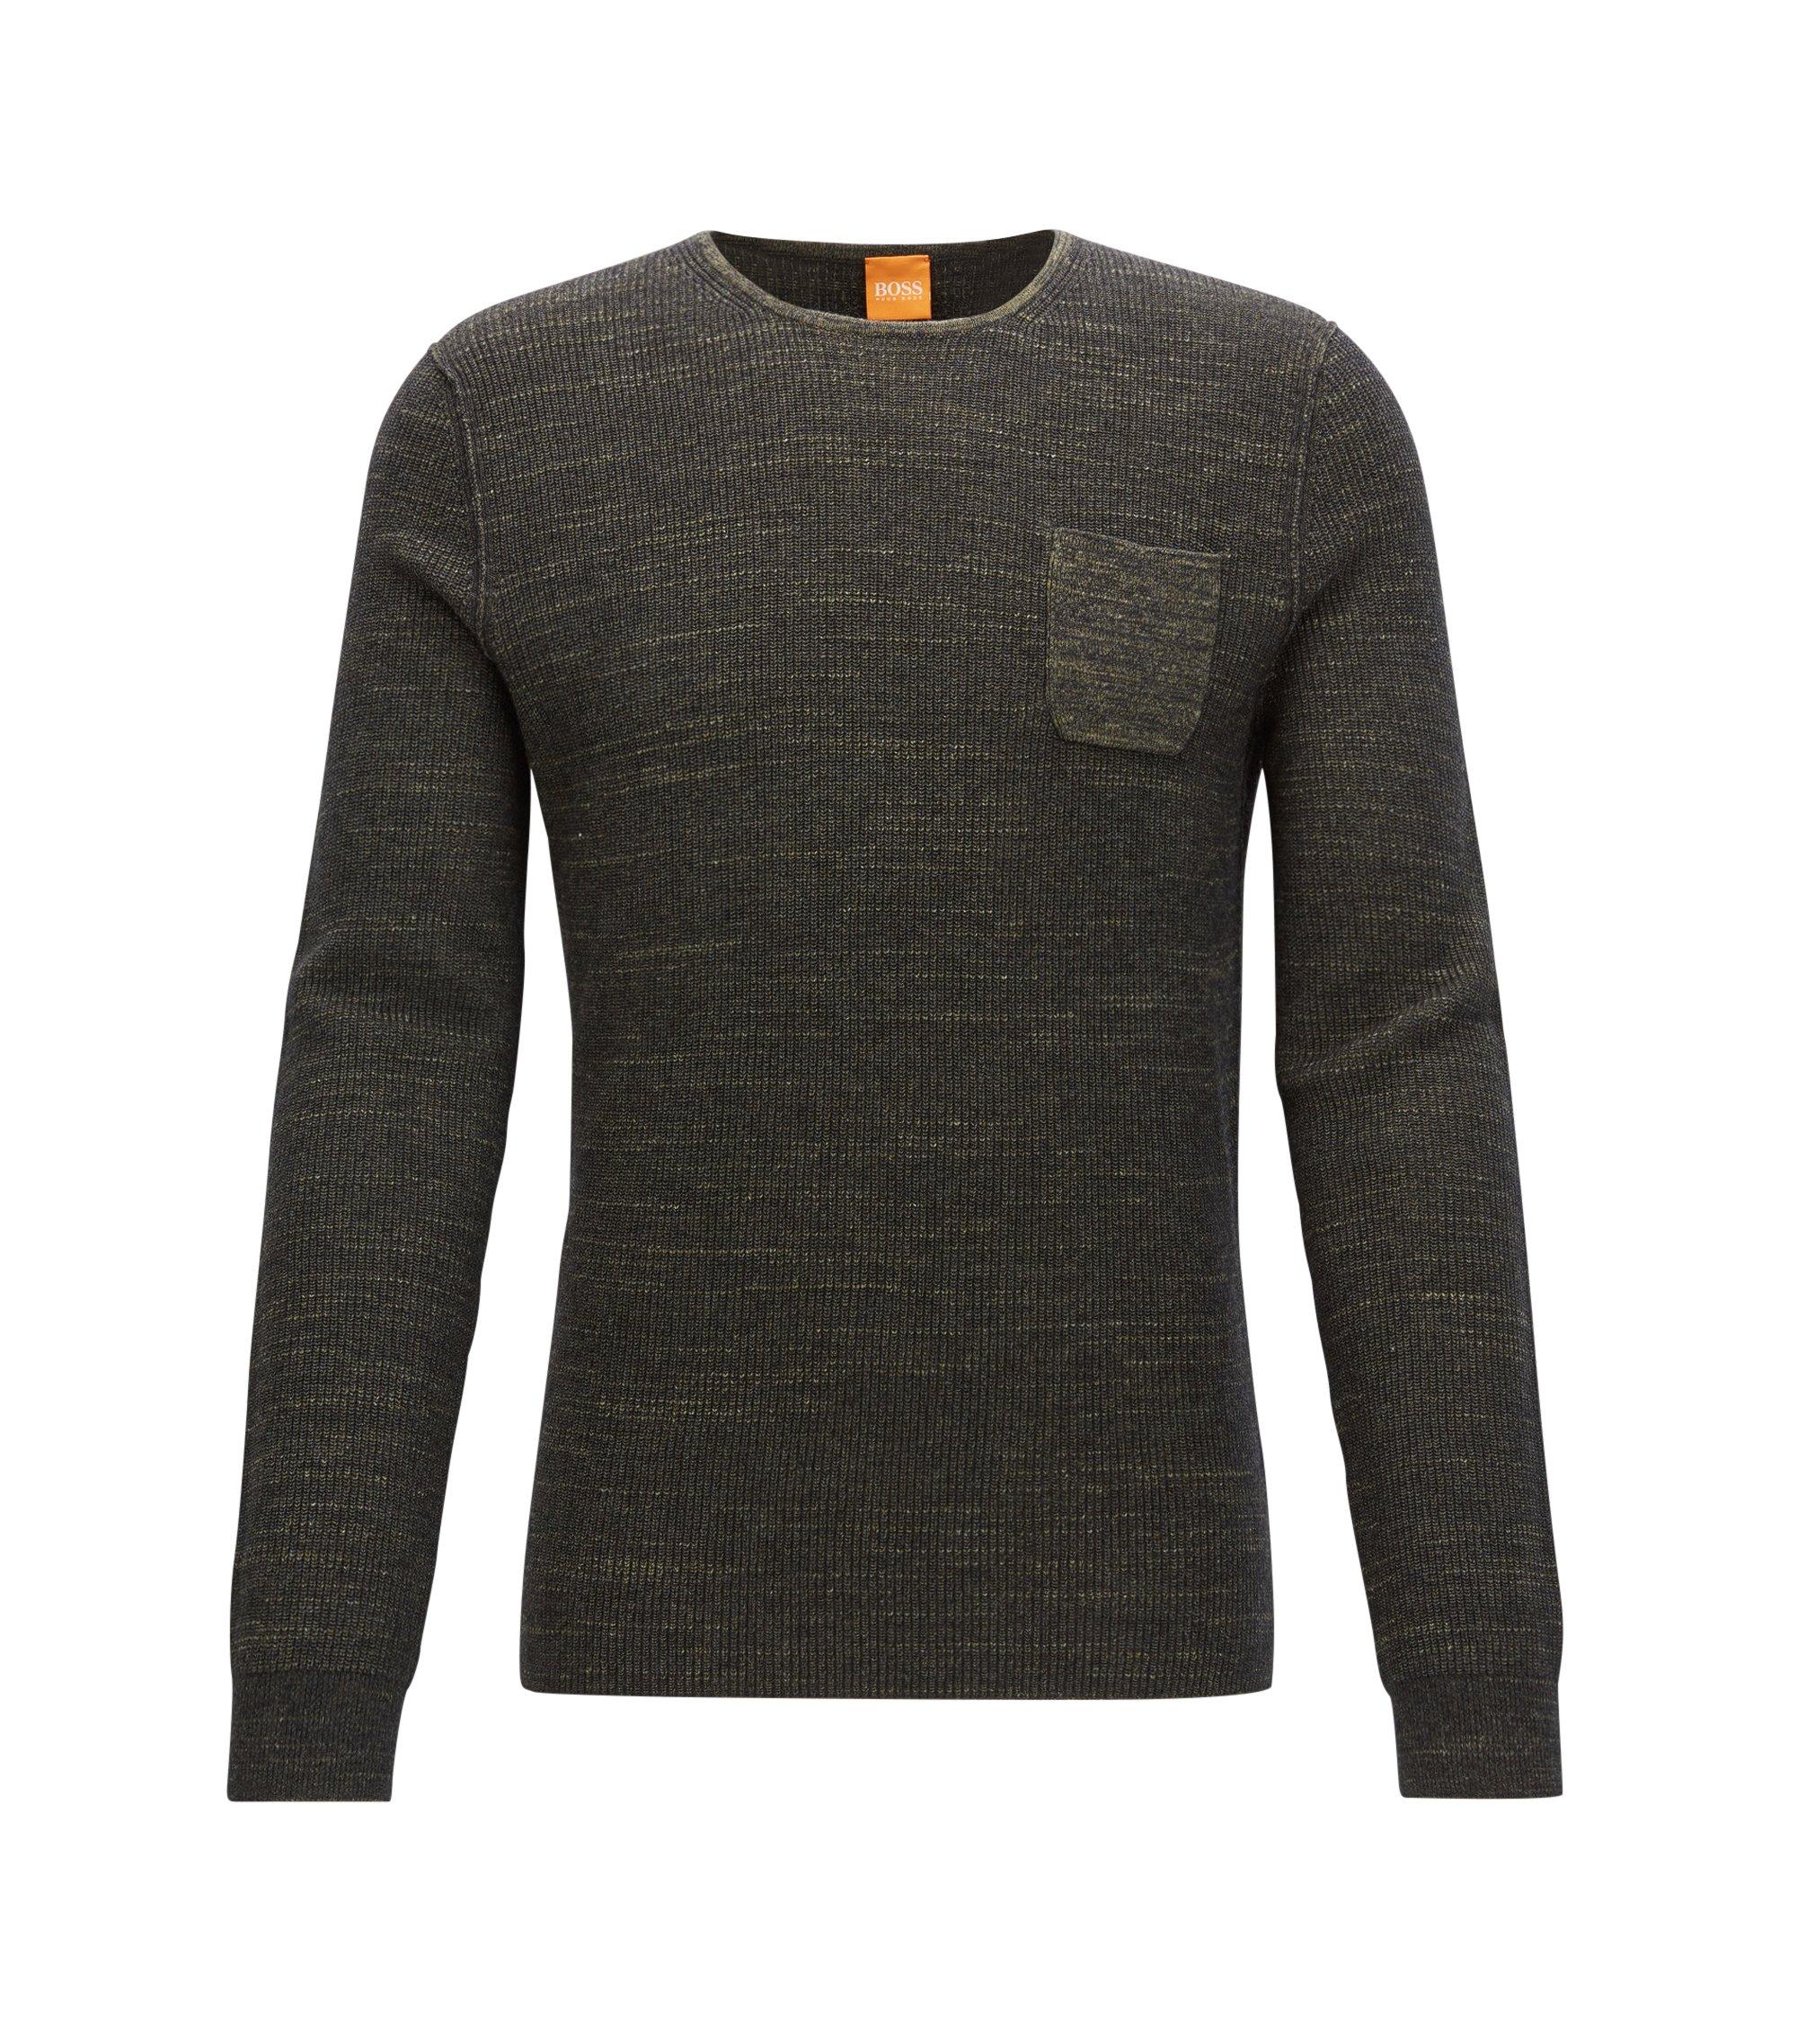 Cotton Blend Sweater   Kutask, Dark Green